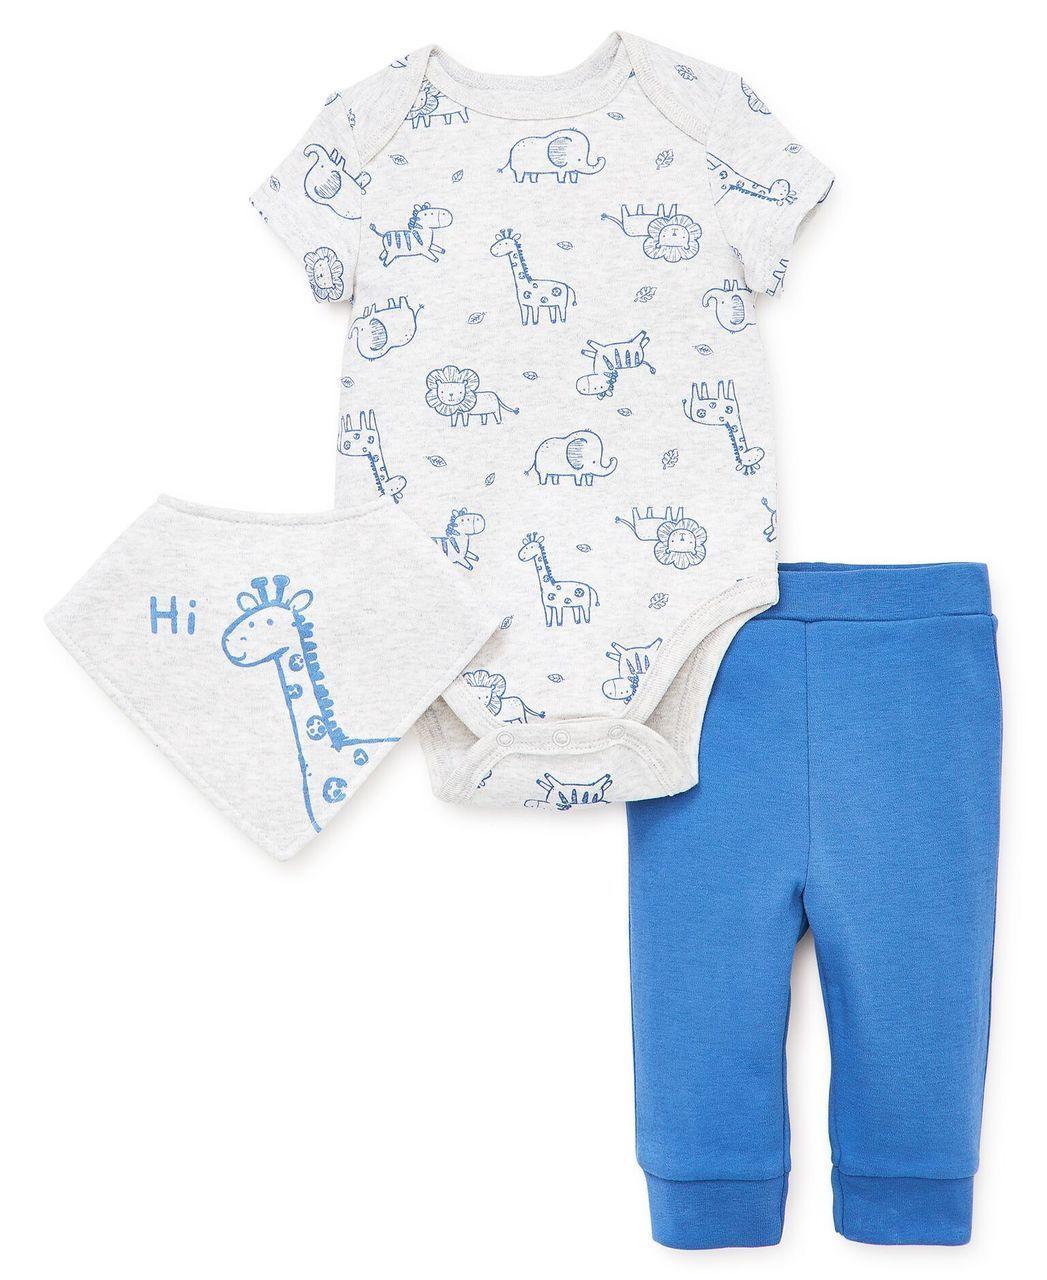 Little Me   Boys Pant Sets   Safari Bandana Bib Pant Set   Baby boy  clothing sets, Baby pants, Outfit sets